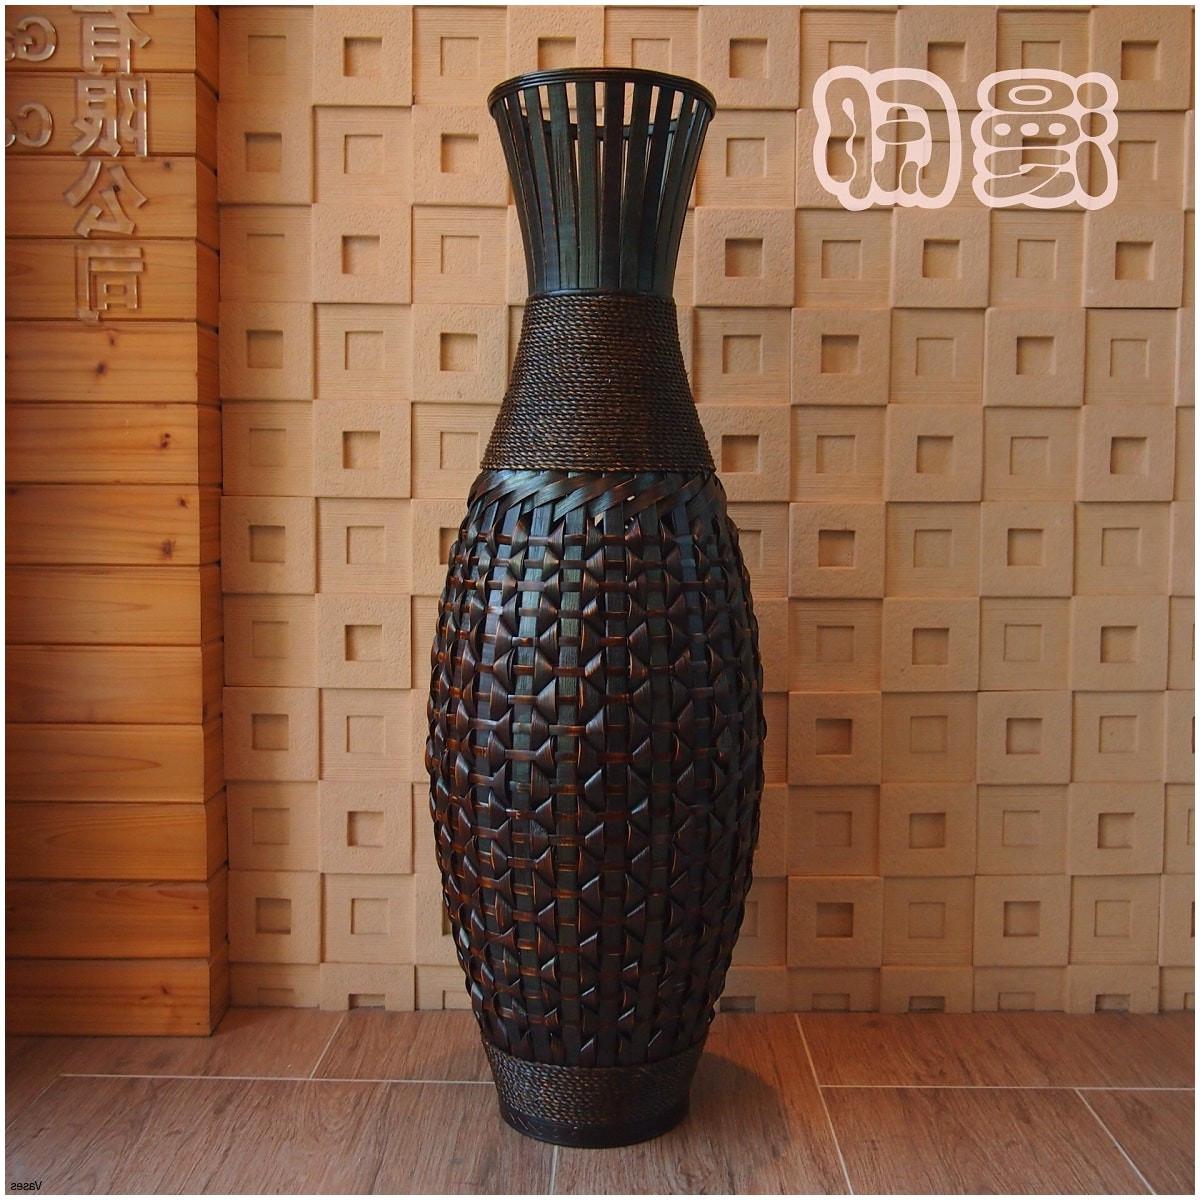 oriental accent vase of 21 beau decorative vases anciendemutu org with regard to mesmerizing wicker floor vase 107 vases uk cheap saleh sale fulli 0d